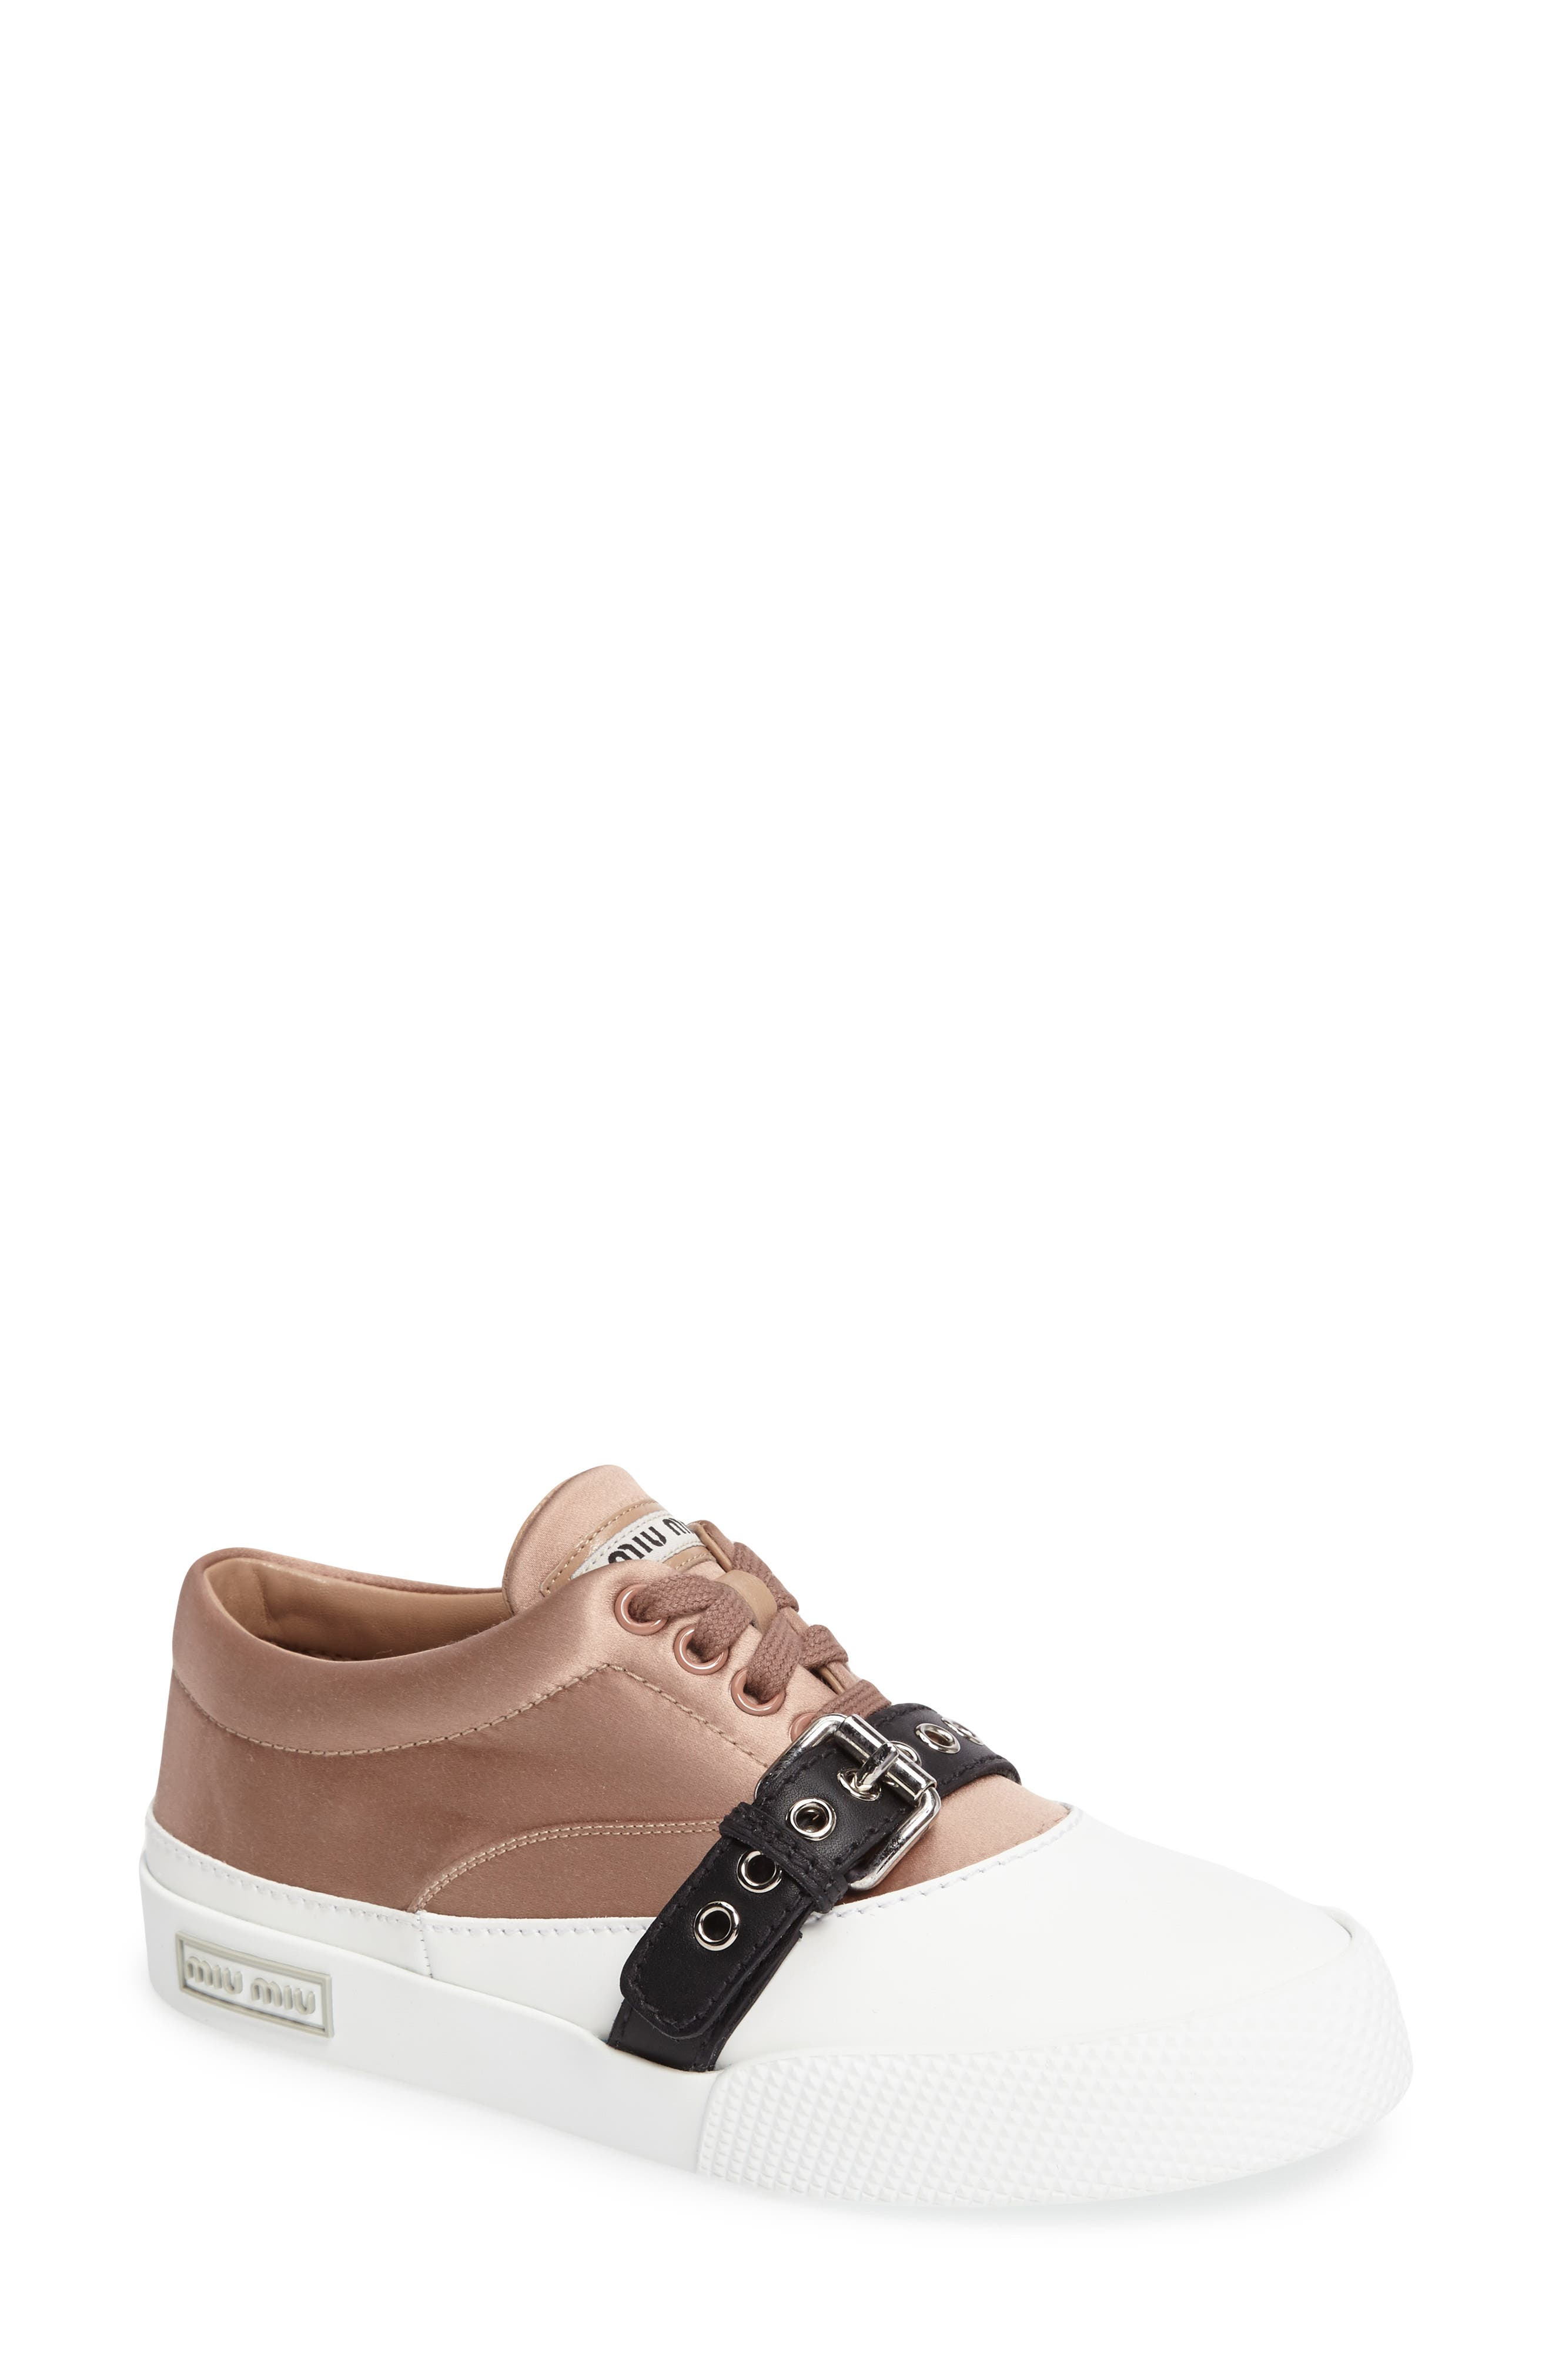 Main Image - Miu Miu Belted Sneaker (Women)